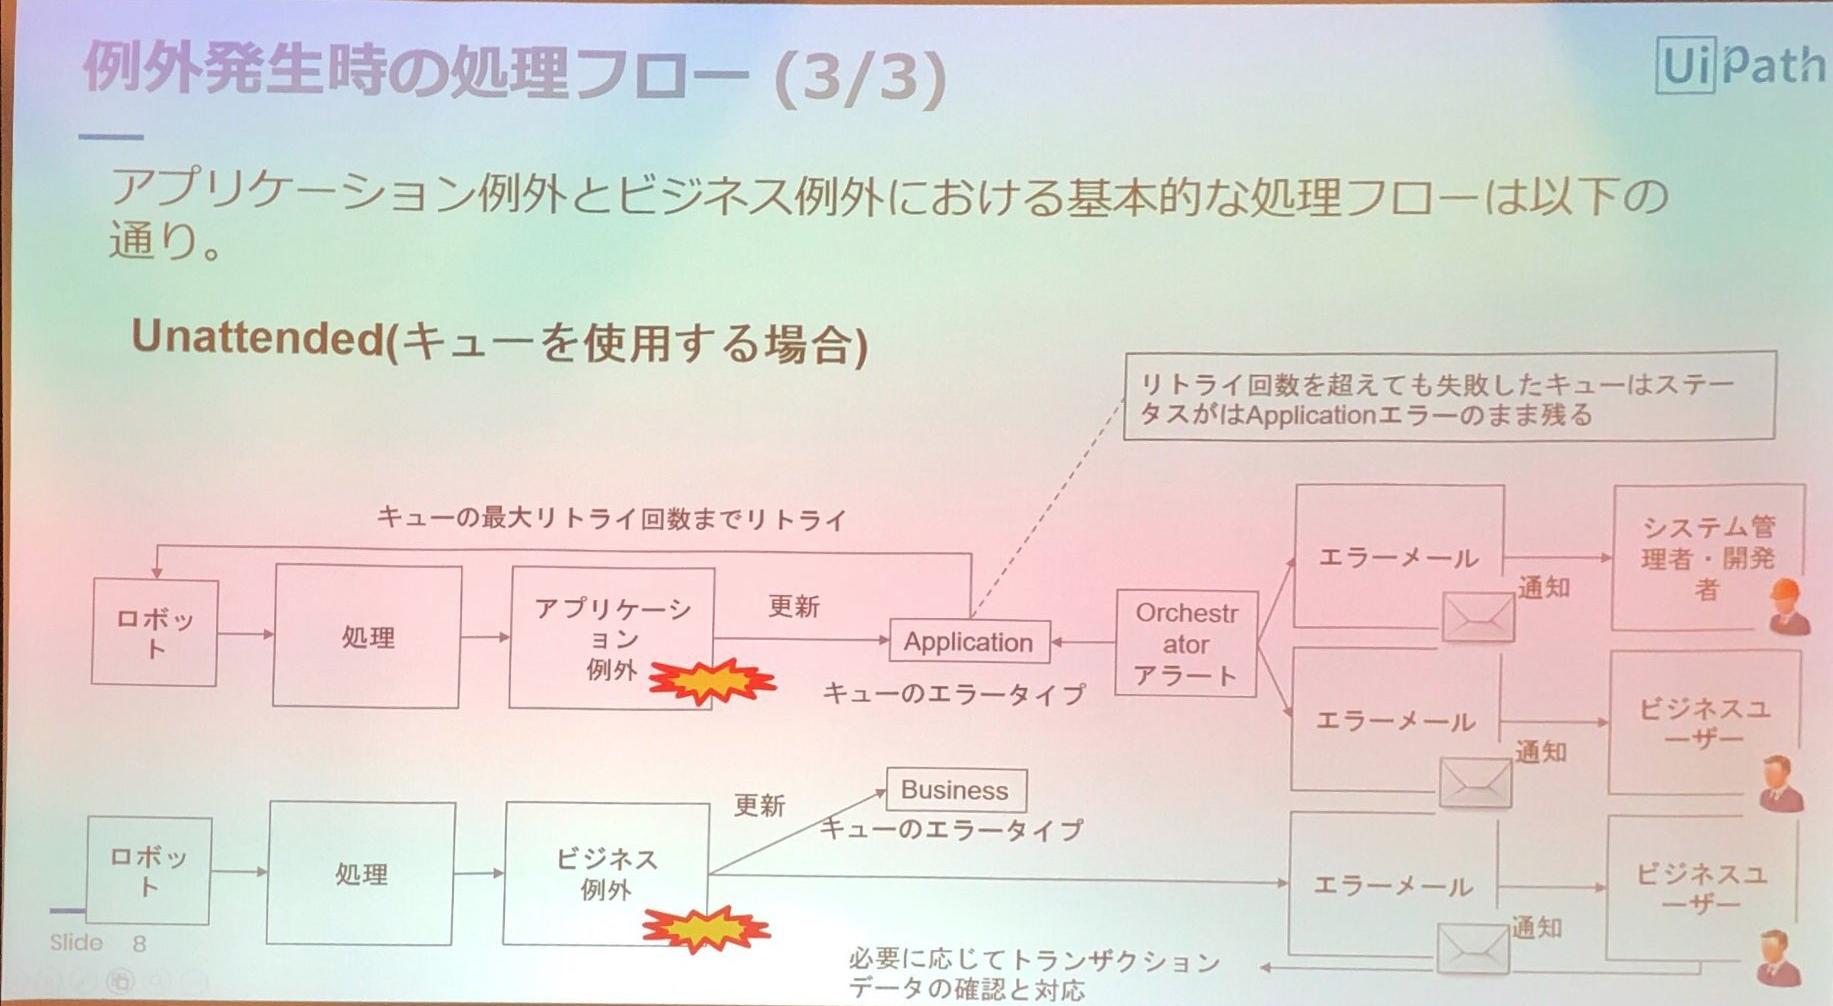 UiPath Developer Community 第9回ワークショップ 覚え書き